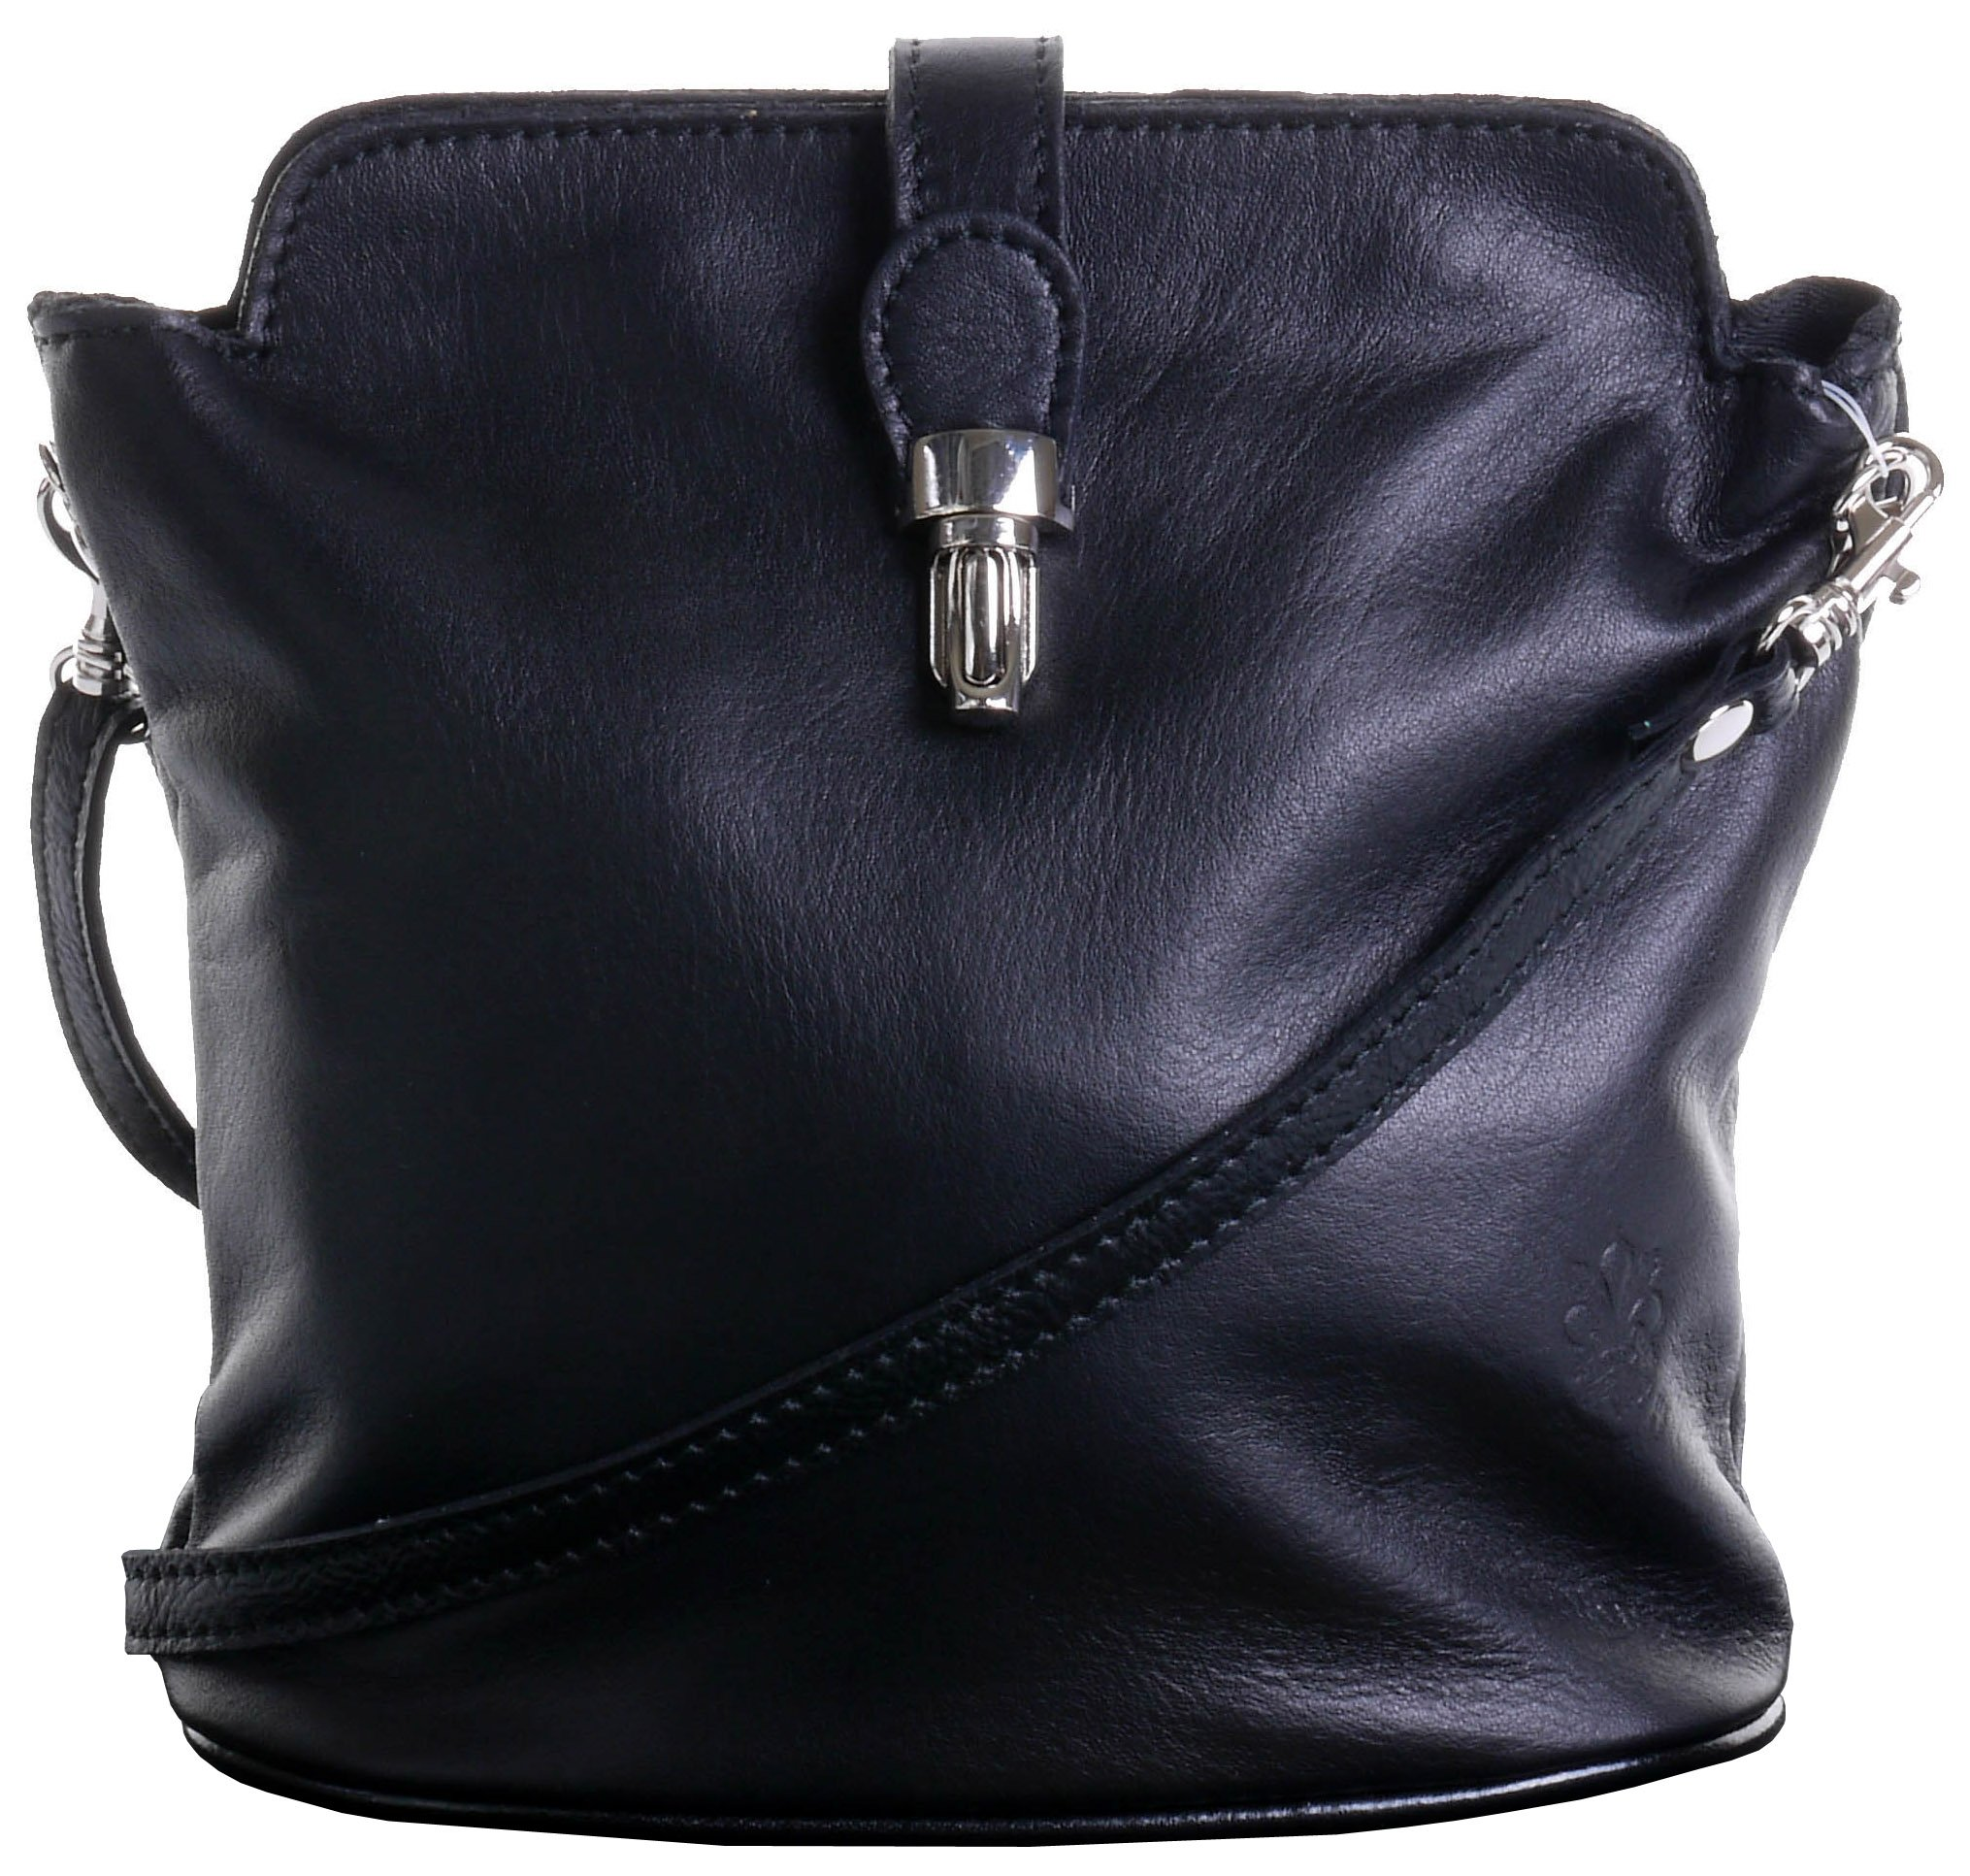 Primo Sacchi® Italian Leather Hand Made Adjustable Strap Cross Body or Shoulder  Bag Handbag. 41a2dccc78e92